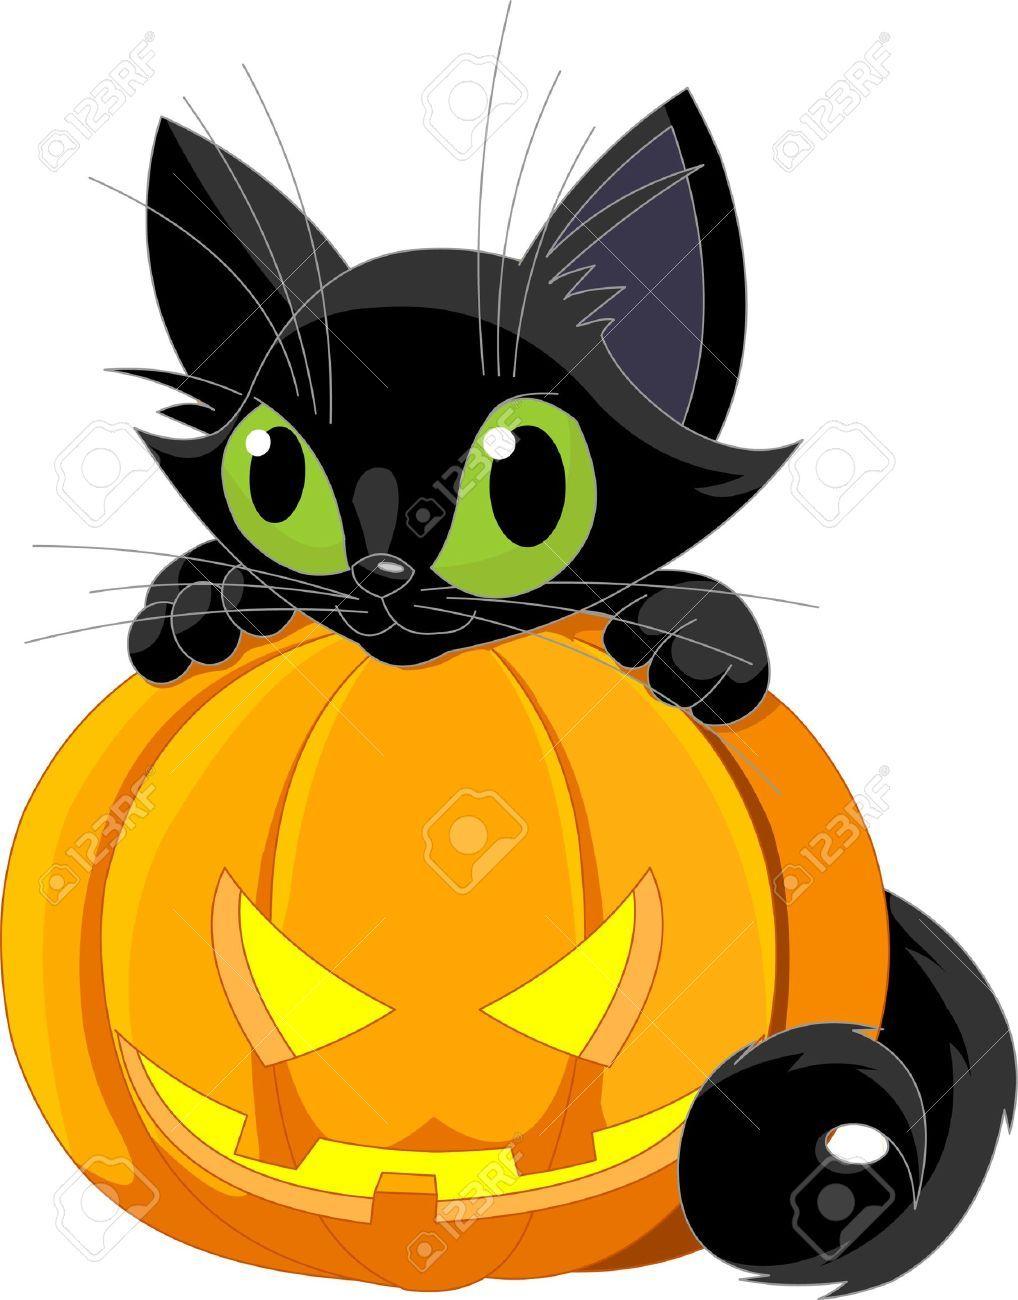 1018x1300 7879532 A Cute Black Cat On A Halloween Pumpkin Stock Photo.jpg